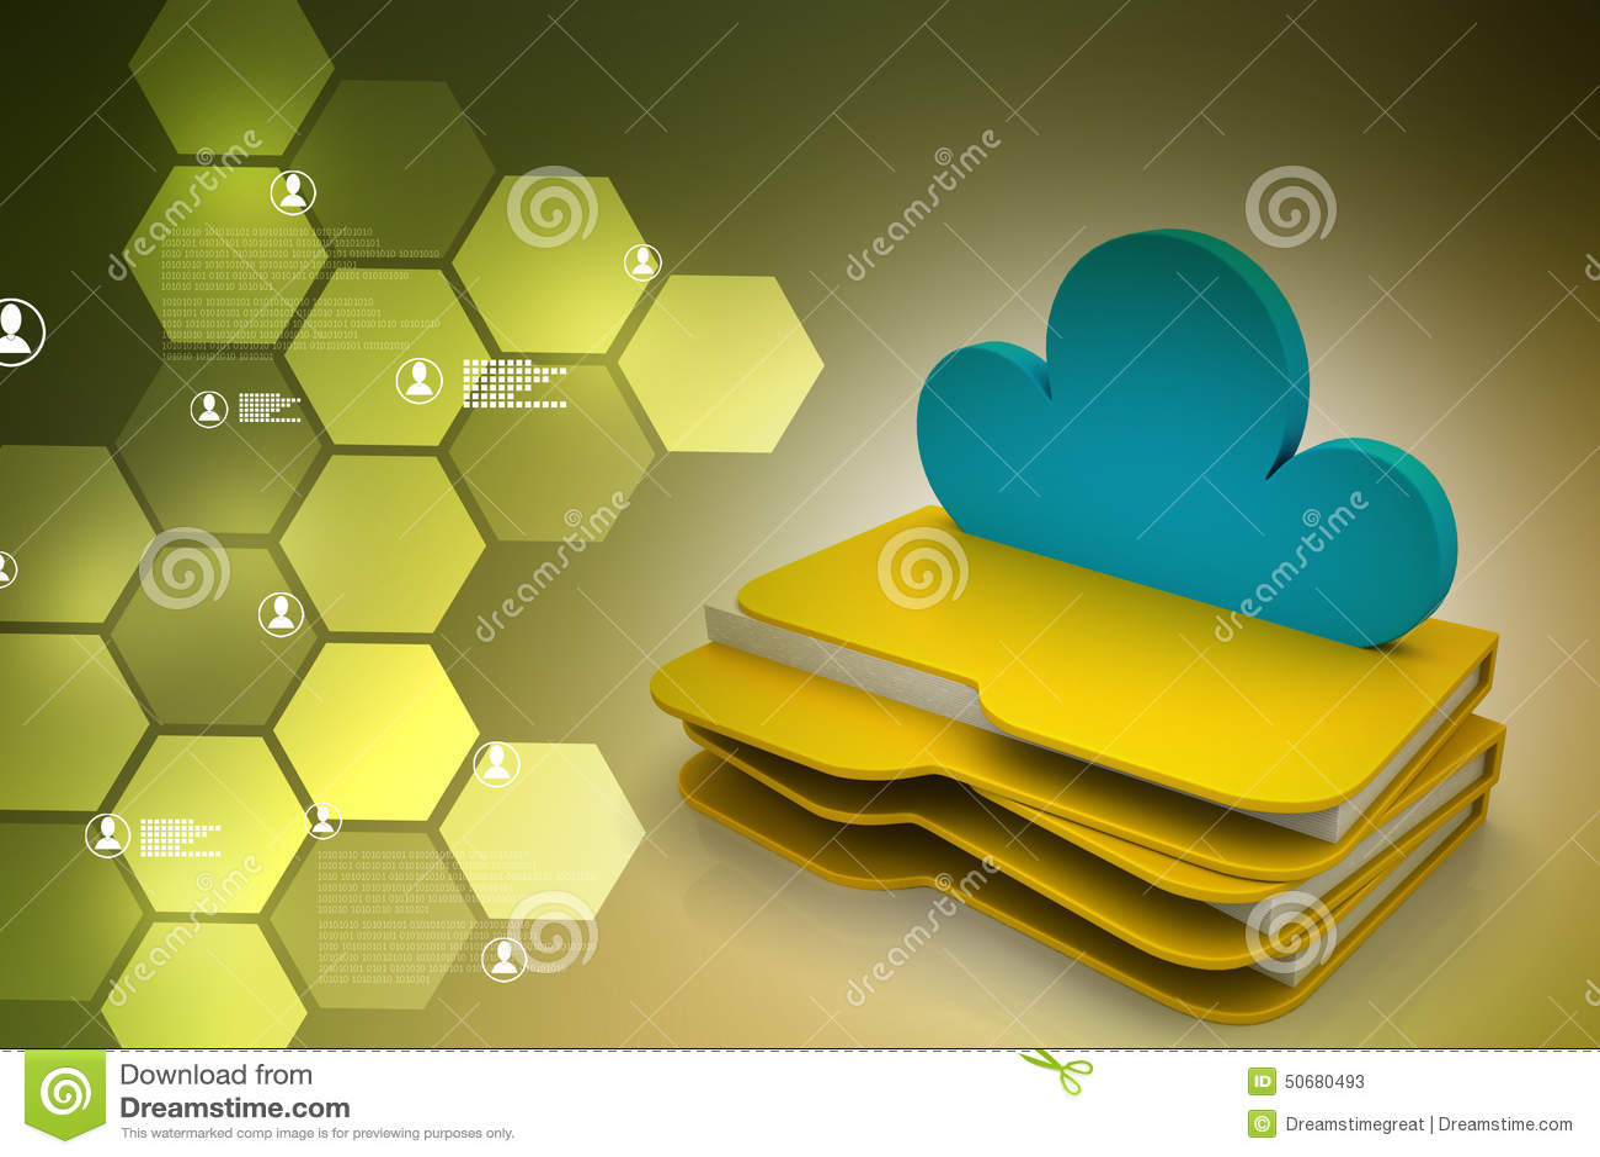 Download 云彩存贮概念 库存例证. 插画 包括有 文件, 数据, 商业, 没人, 流动性, 文件夹, 图象, 网络连接 - 50680493